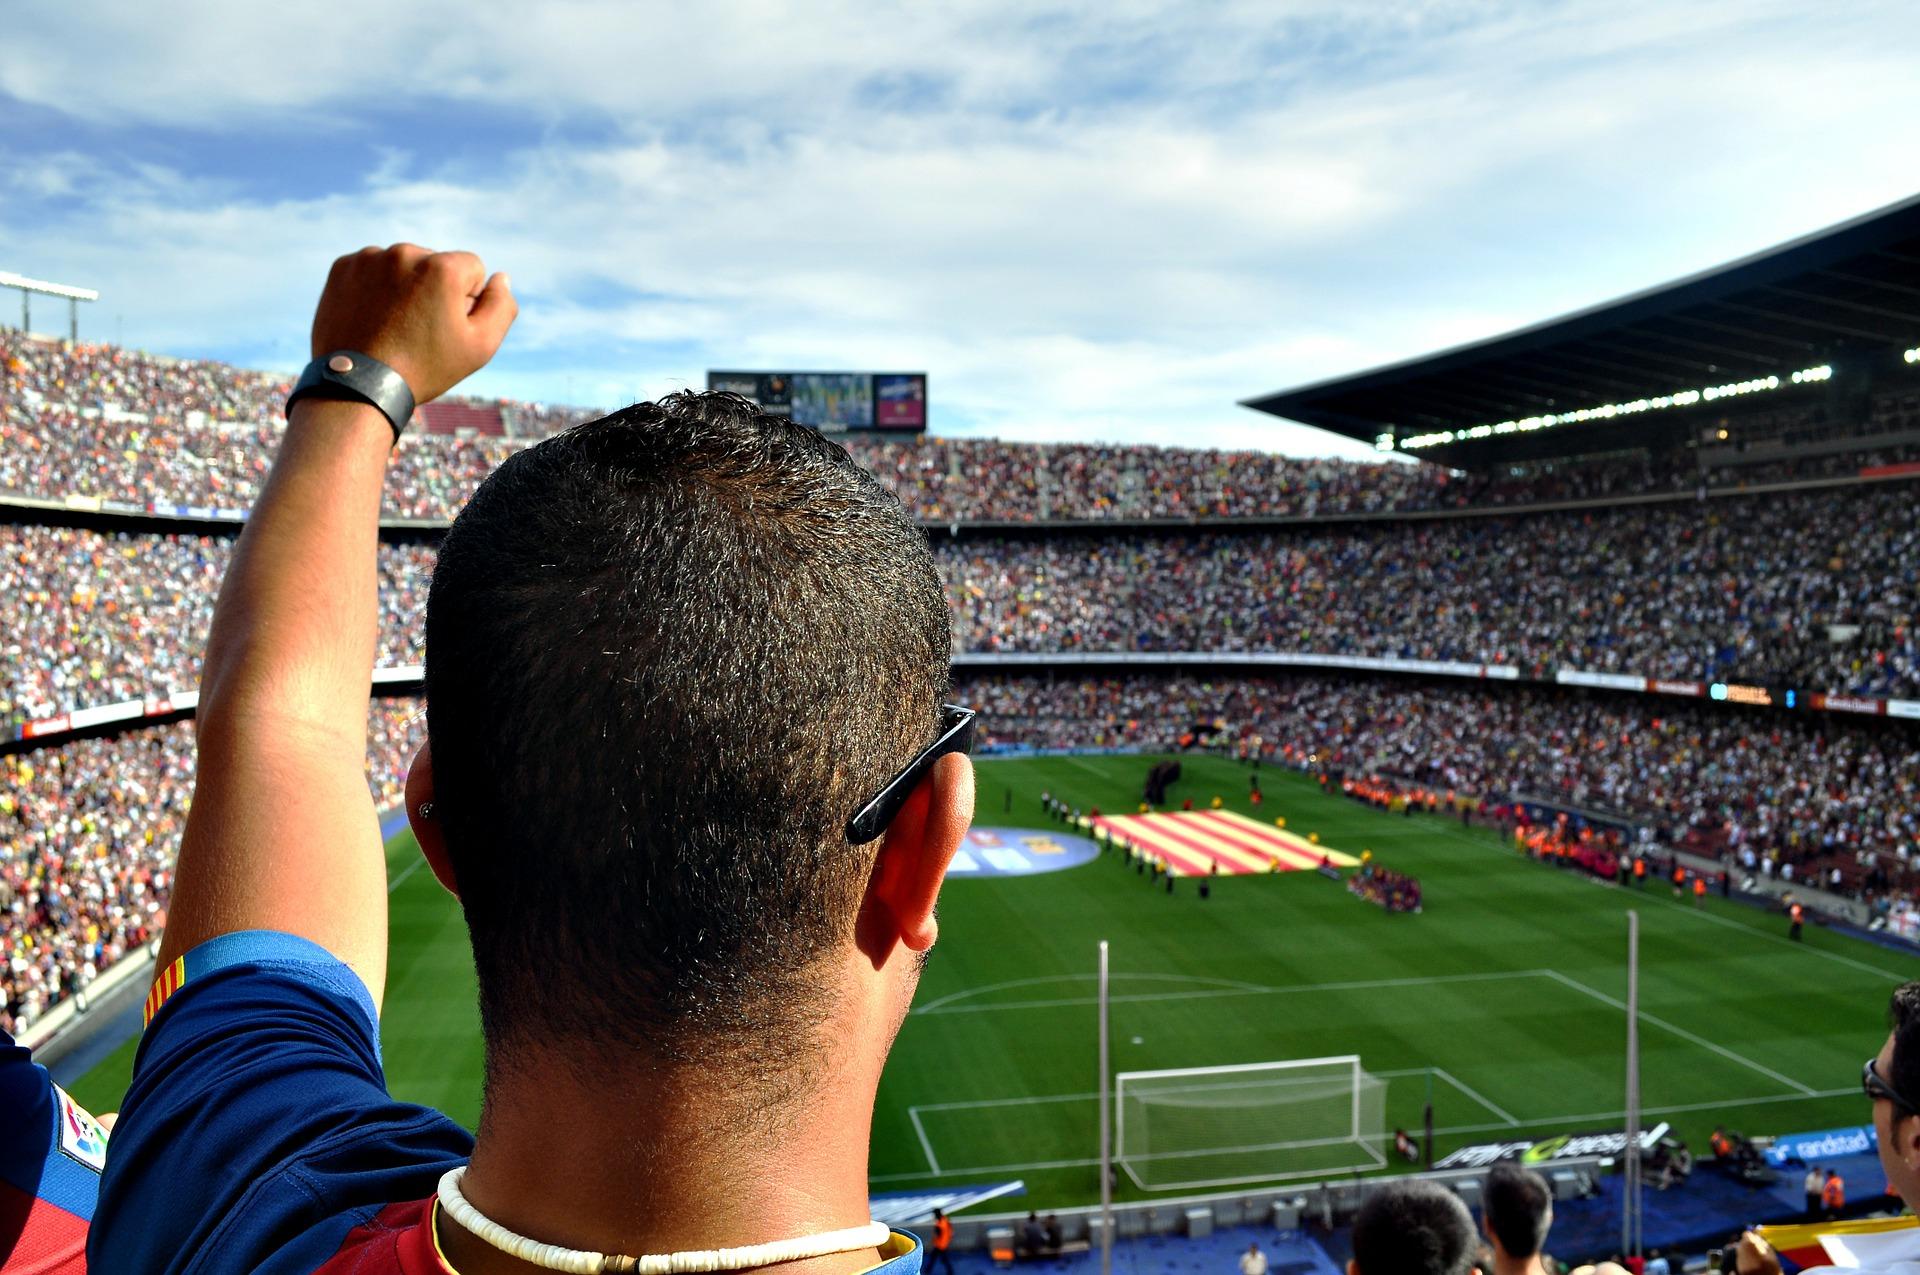 Lån penge til at se Champions League live